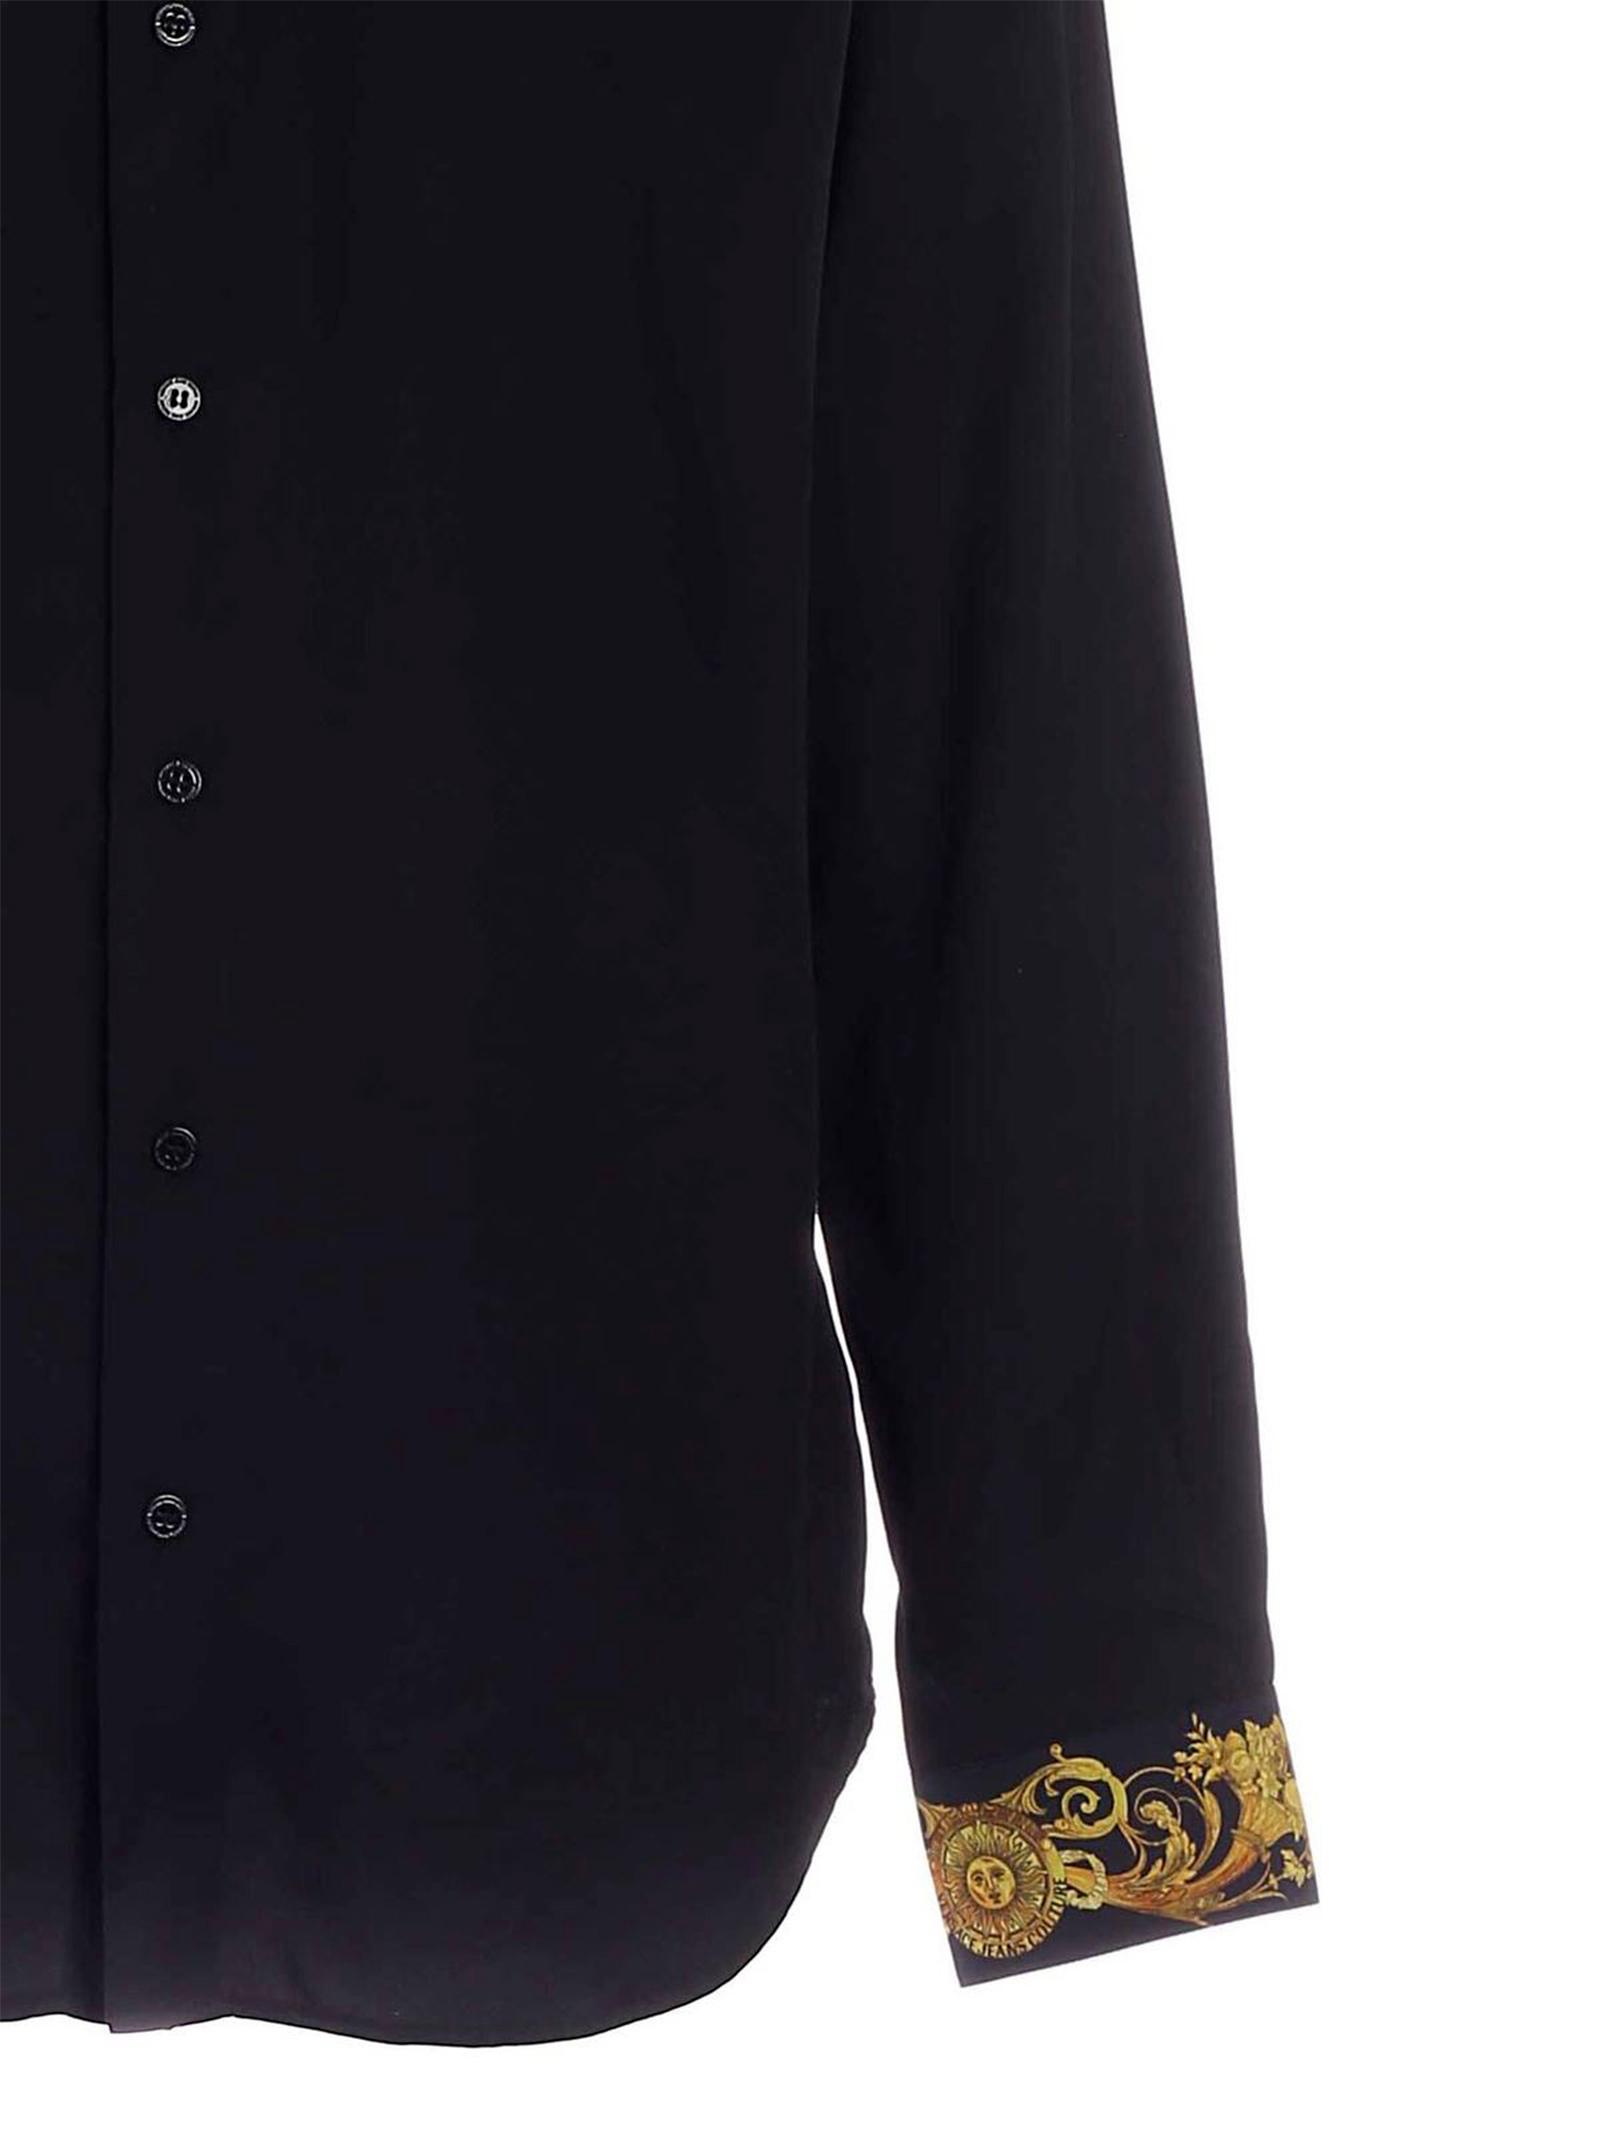 Camicia  Slim Fit VERSACE JEANS | Camicia | B1 GWA6S307619 899